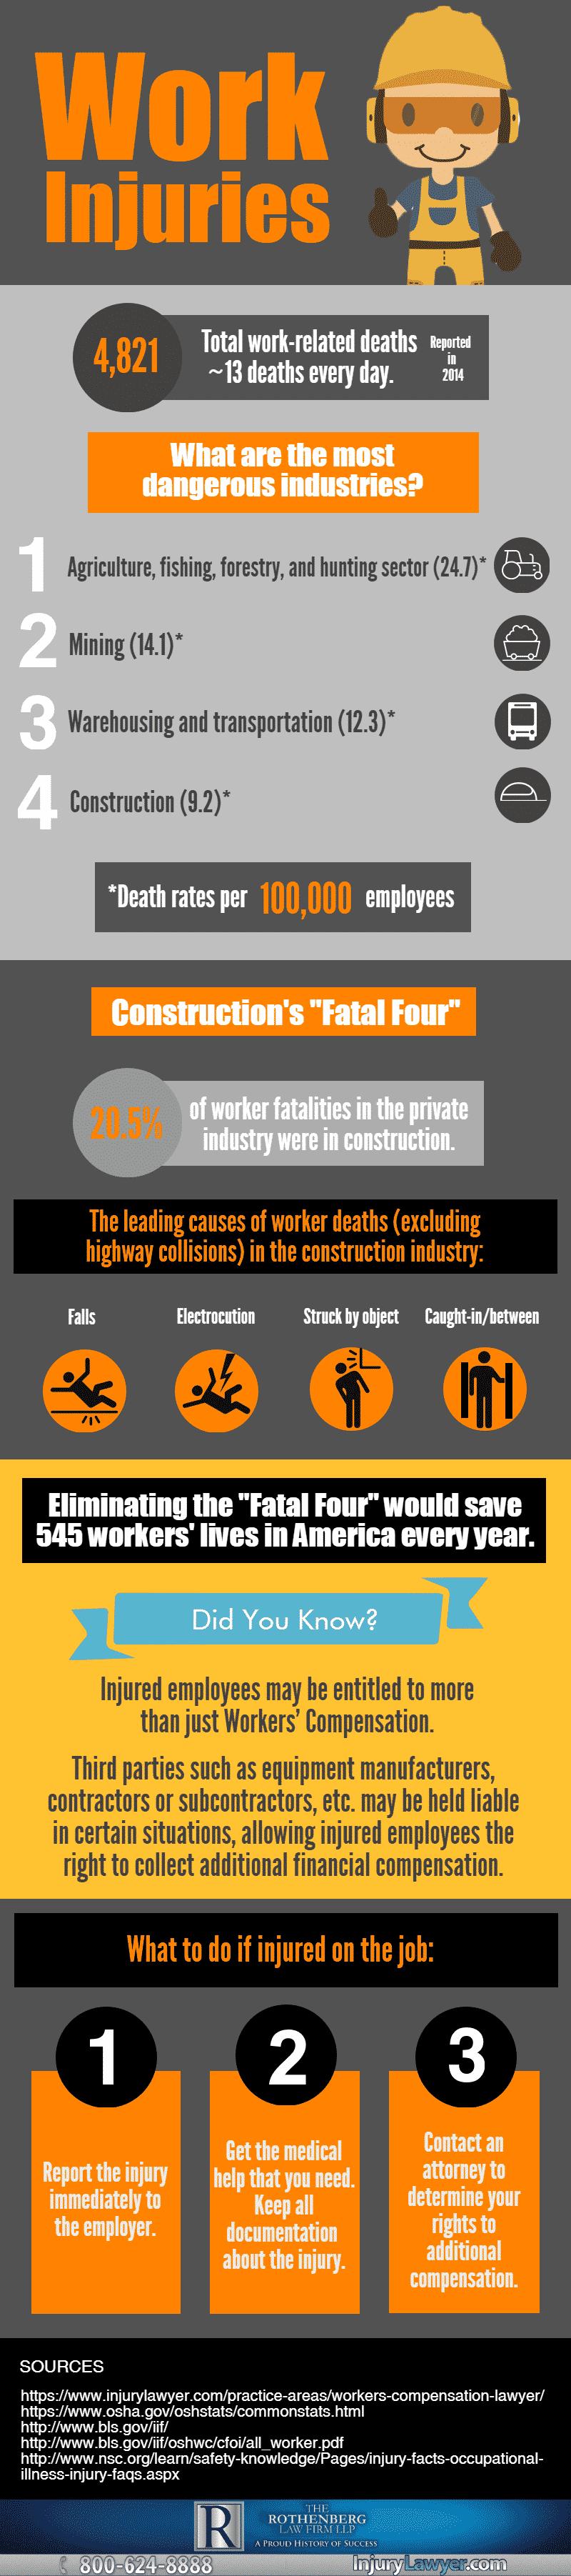 Work Injuries Infographic